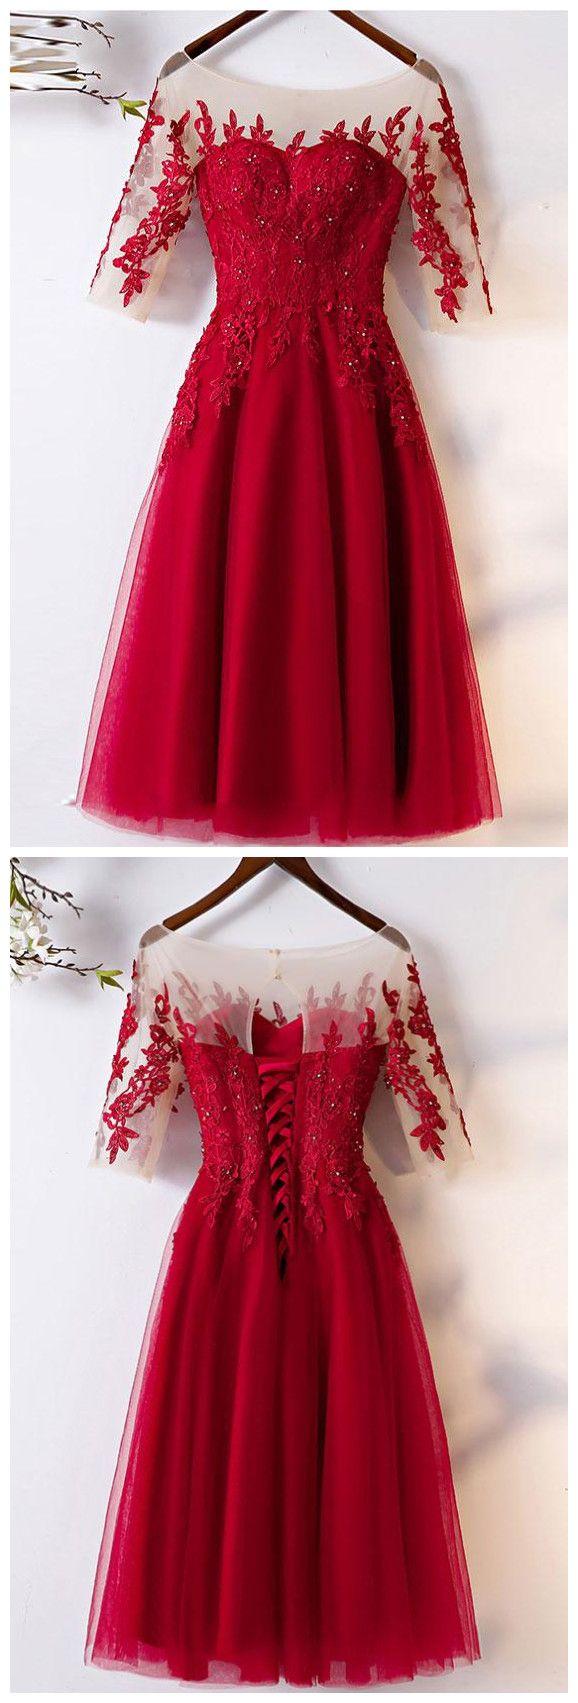 Tulle round neck prom dresstea length half sleeves anne